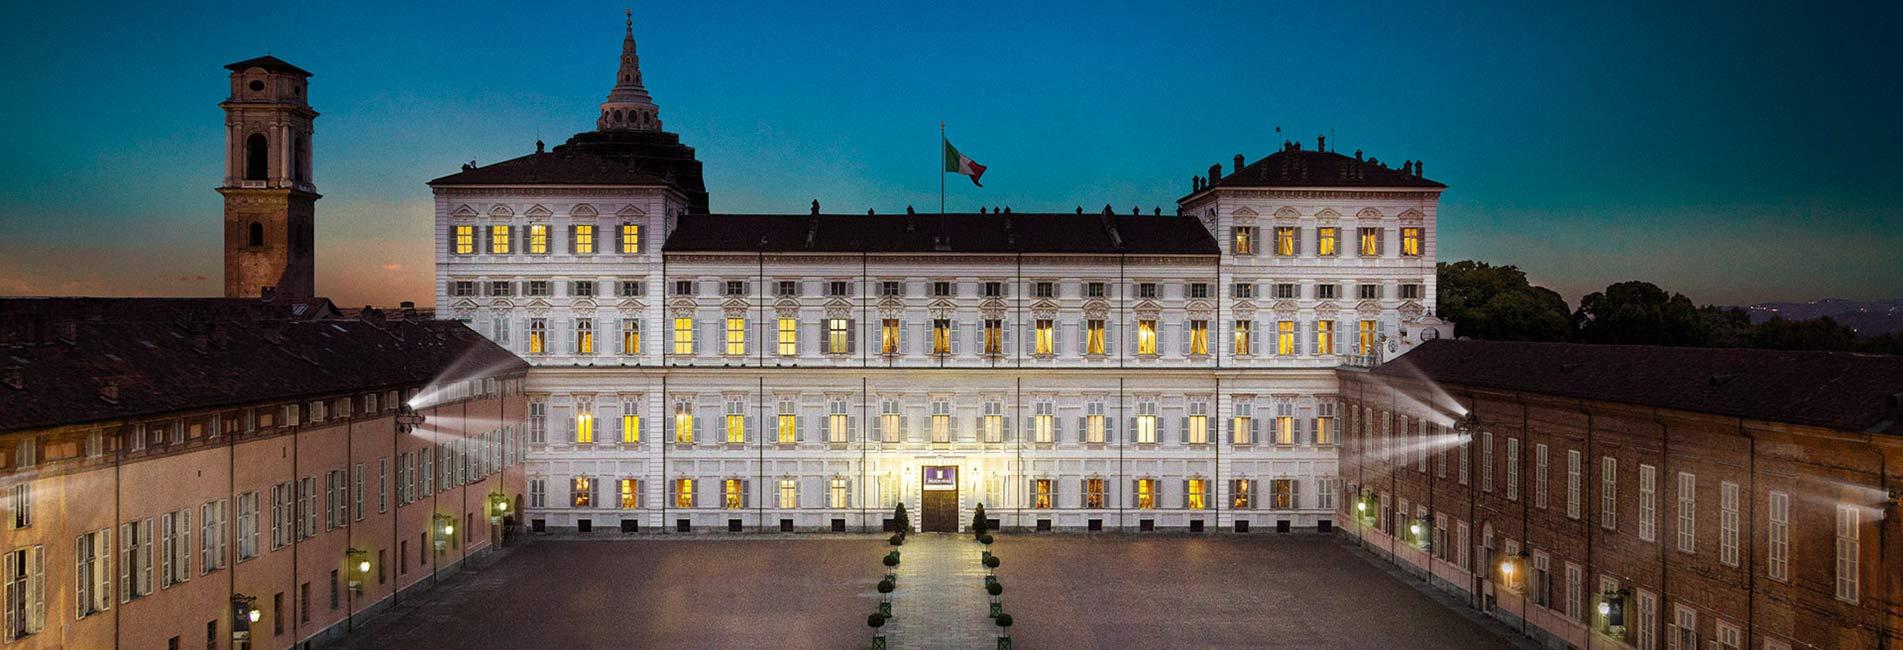 torino_royal_palace_museum_hotel_original_1